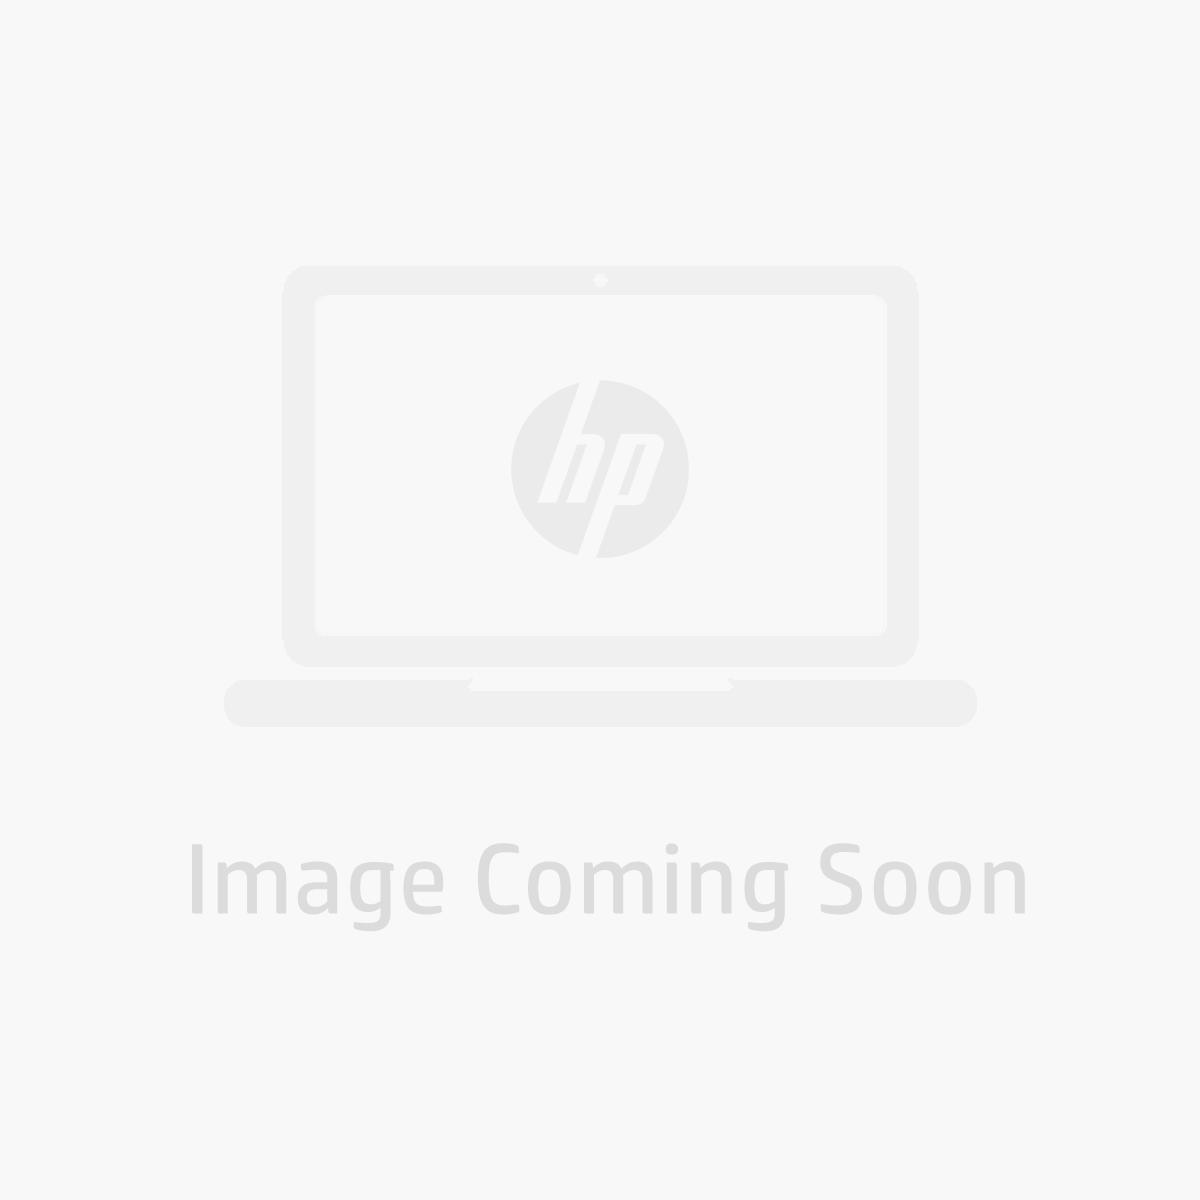 Image of HP HP 92A Black Original LaserJet Toner Cartridge